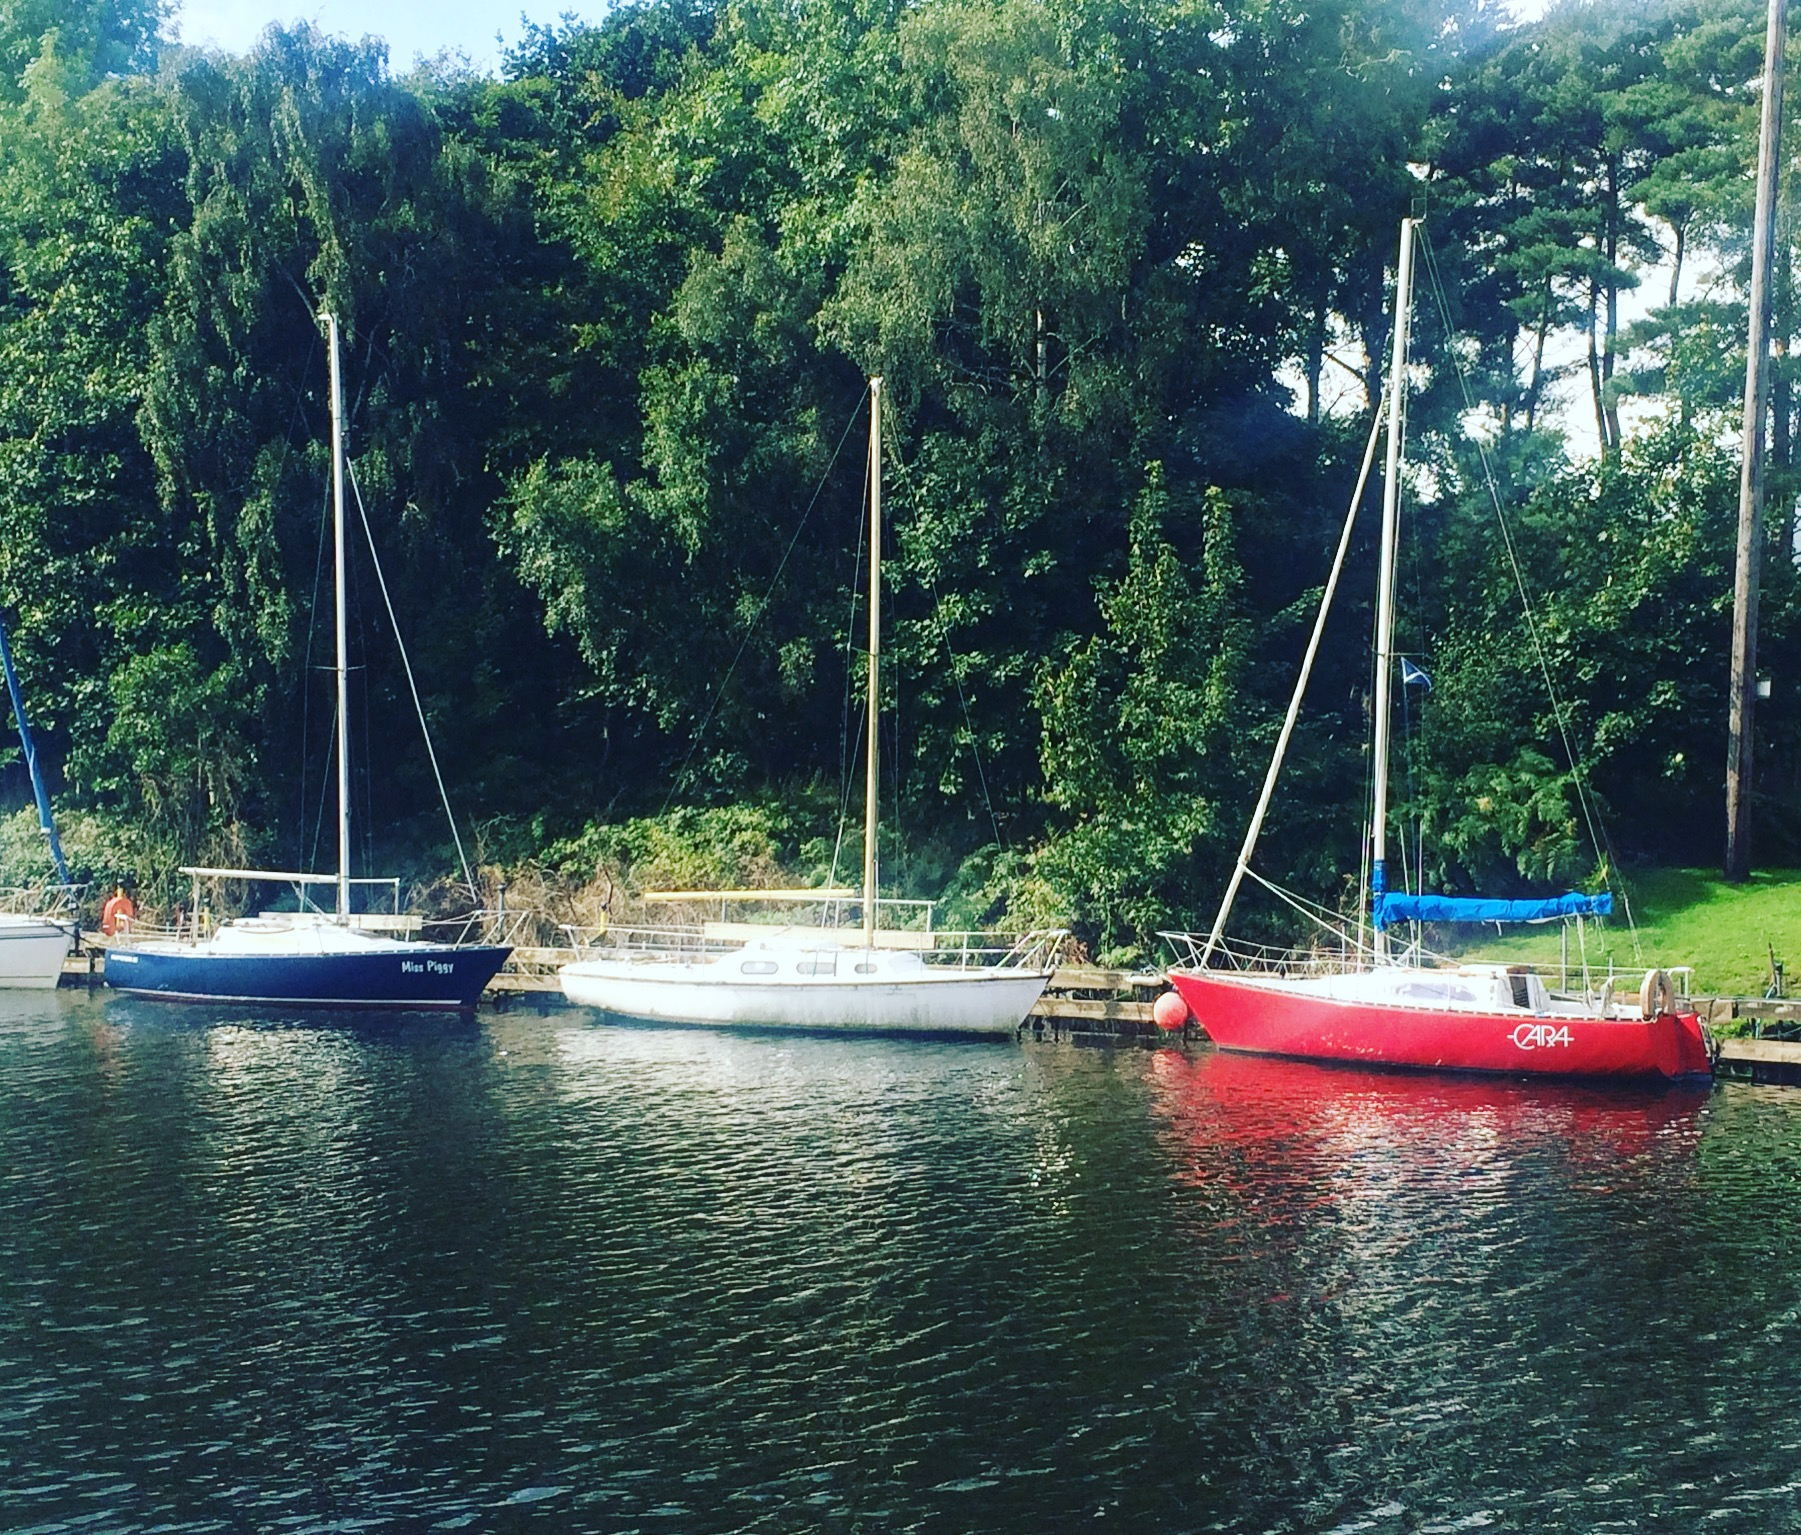 boats_antrim_castle_walled_garden_lough_neagh_northern_ireland_ni_explorer_niexplorer (1)